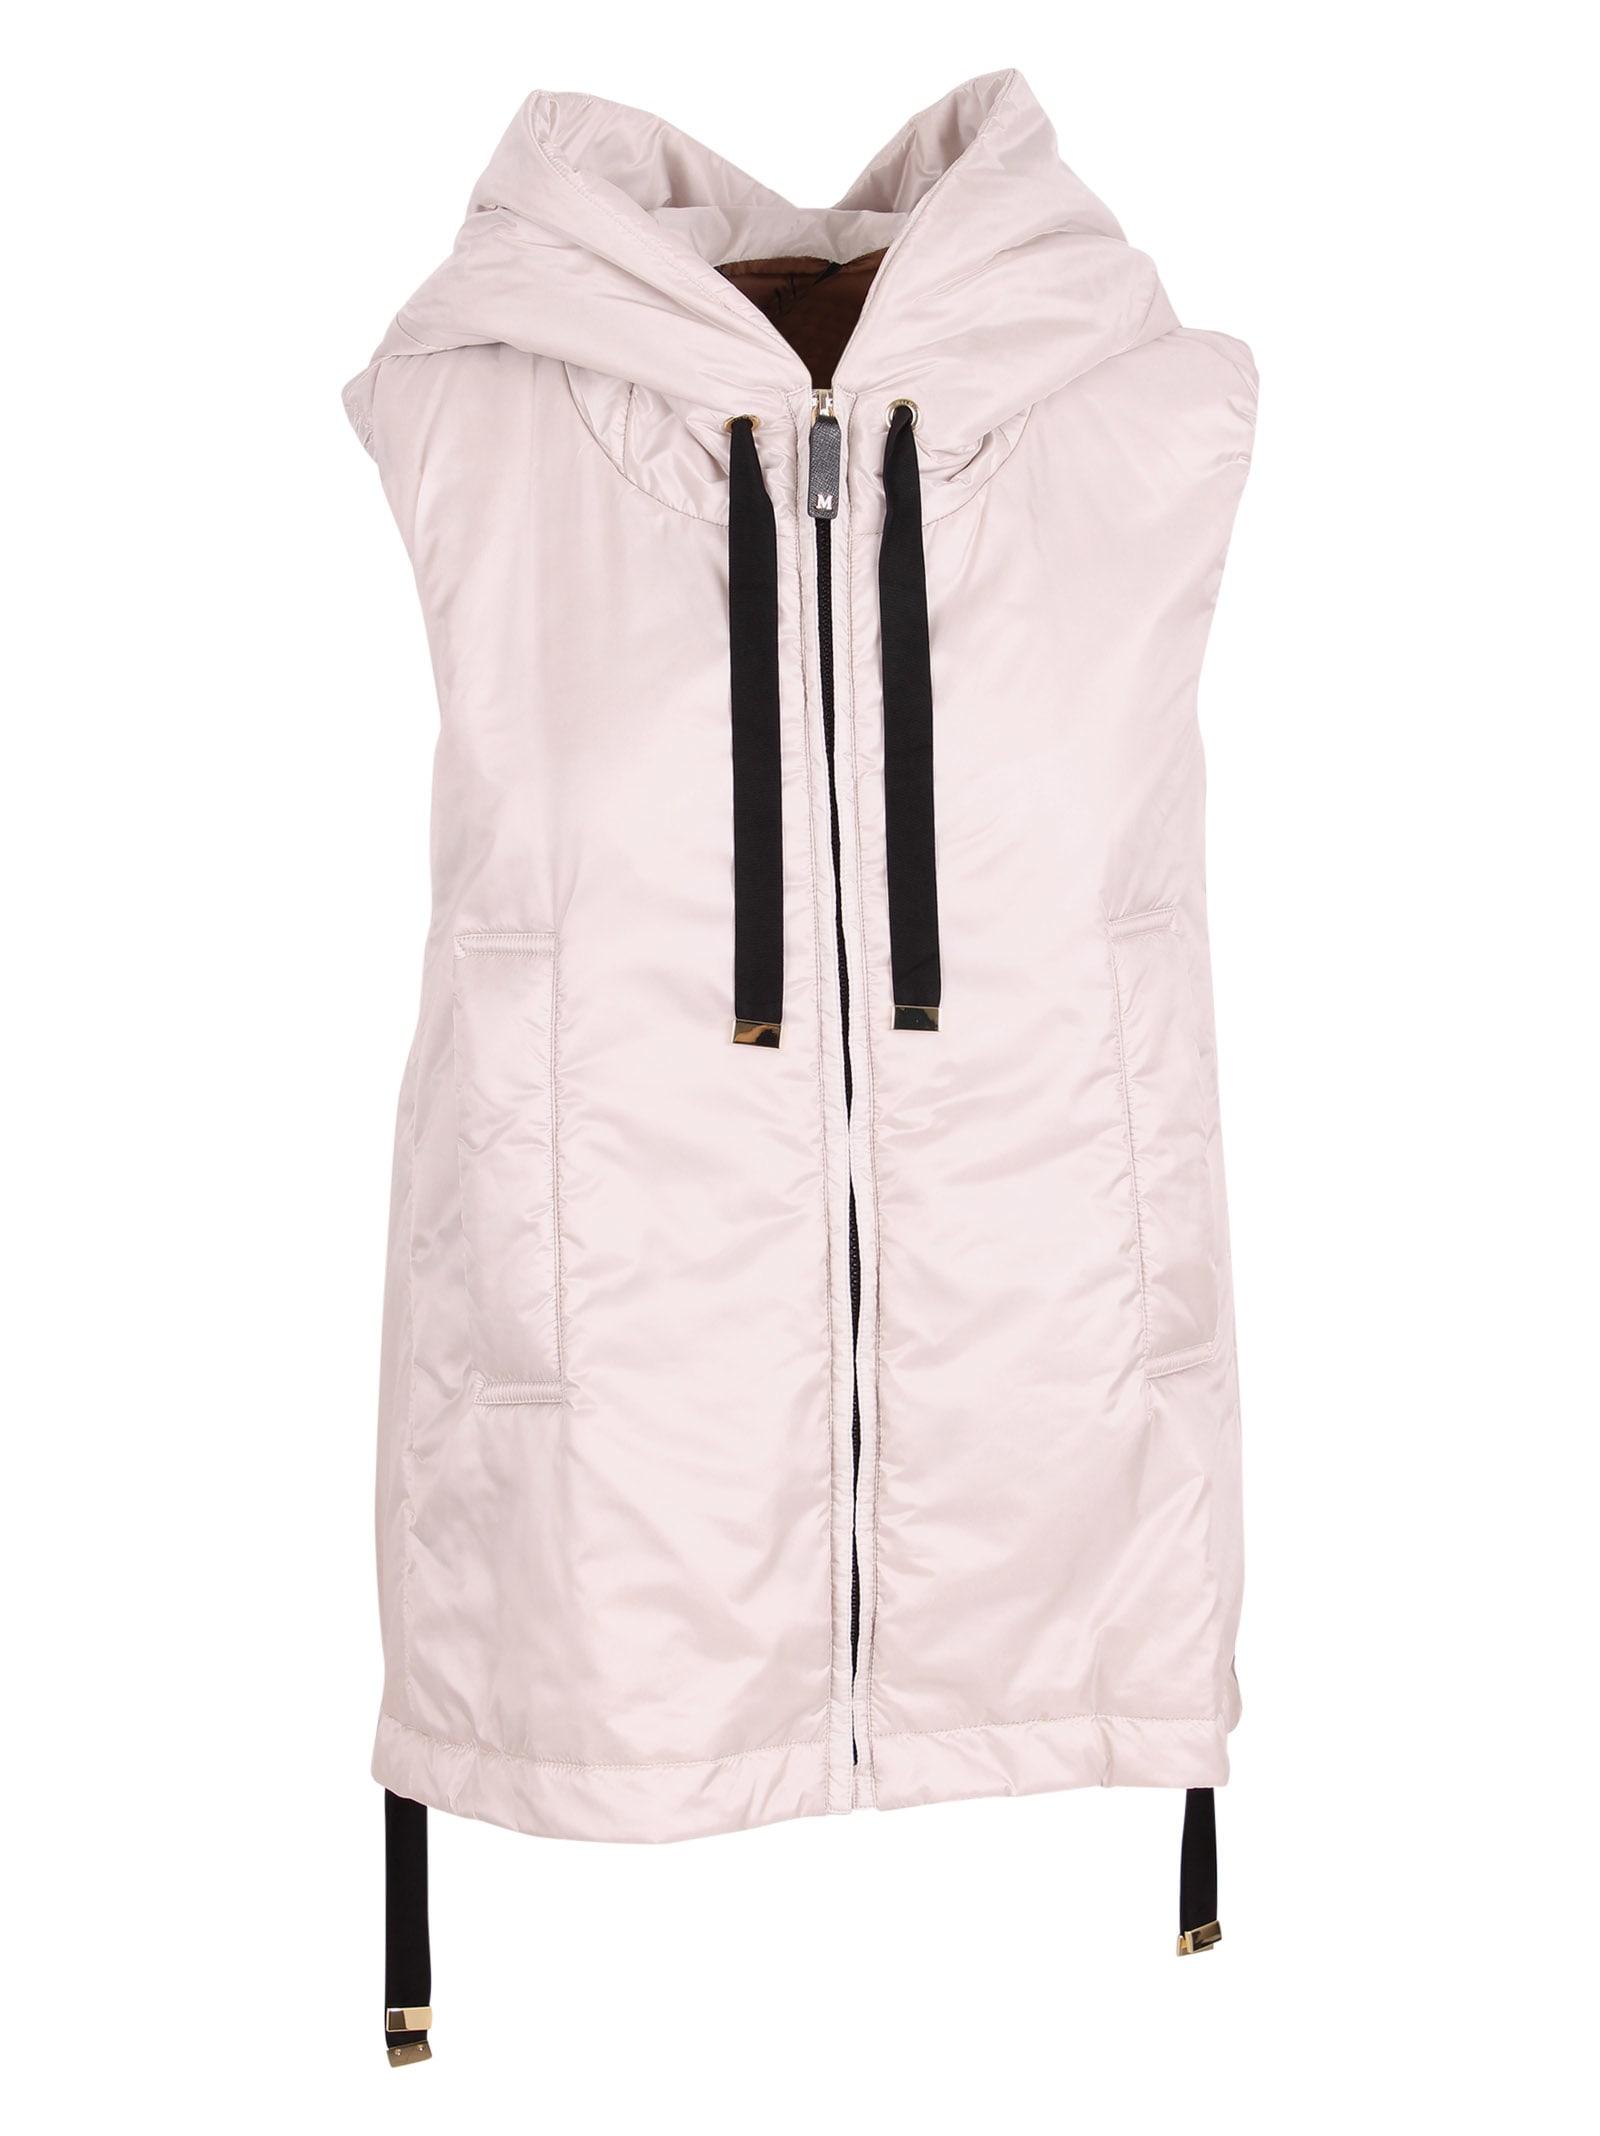 greengo Technical Fabric Vest